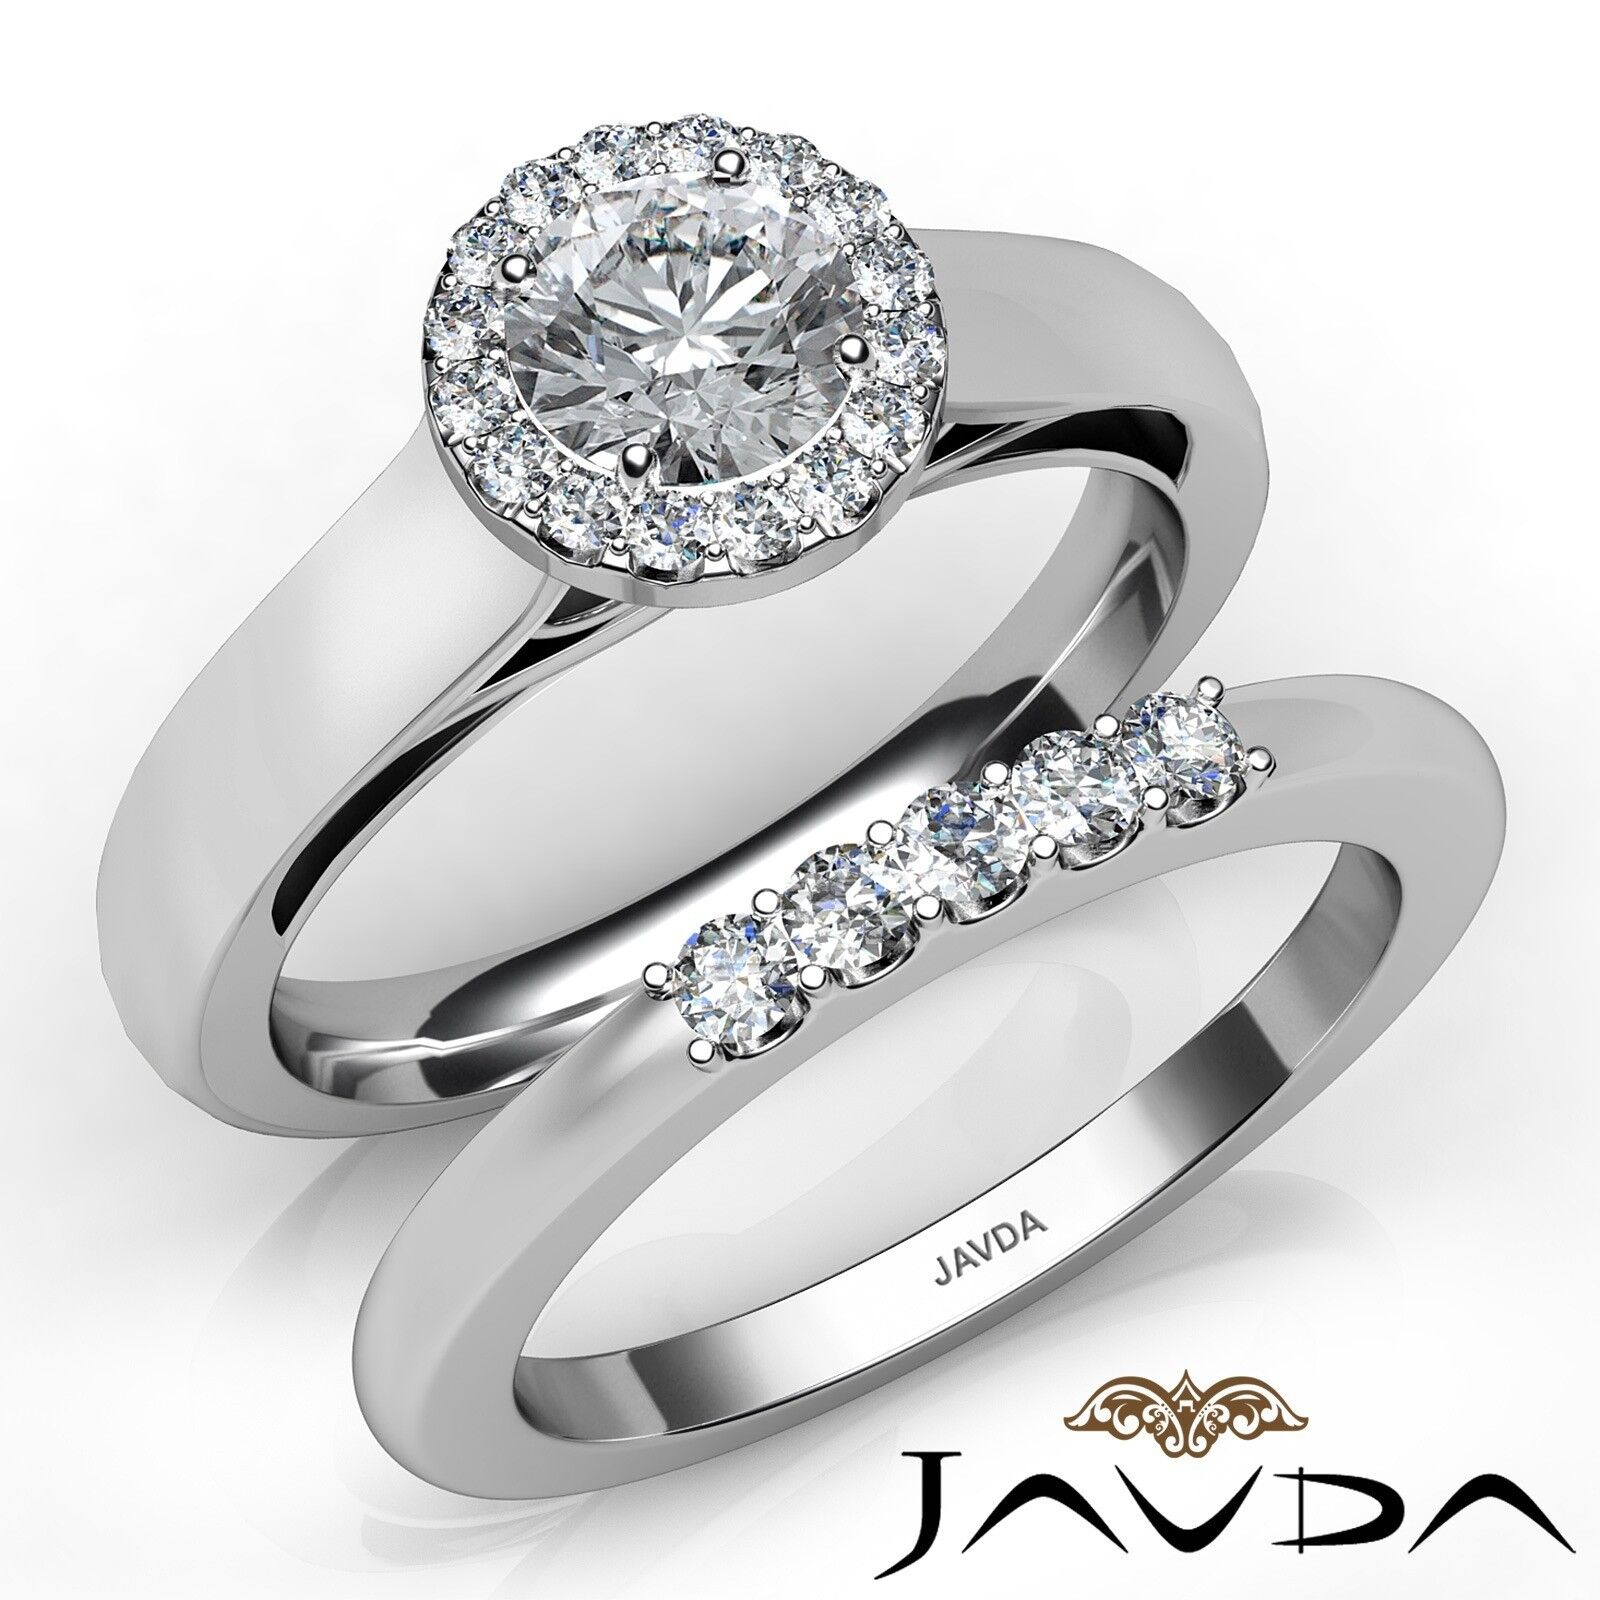 0.8ctw U Prong Halo Bridal Round Diamond Engagement Ring GIA H-SI1 White Gold